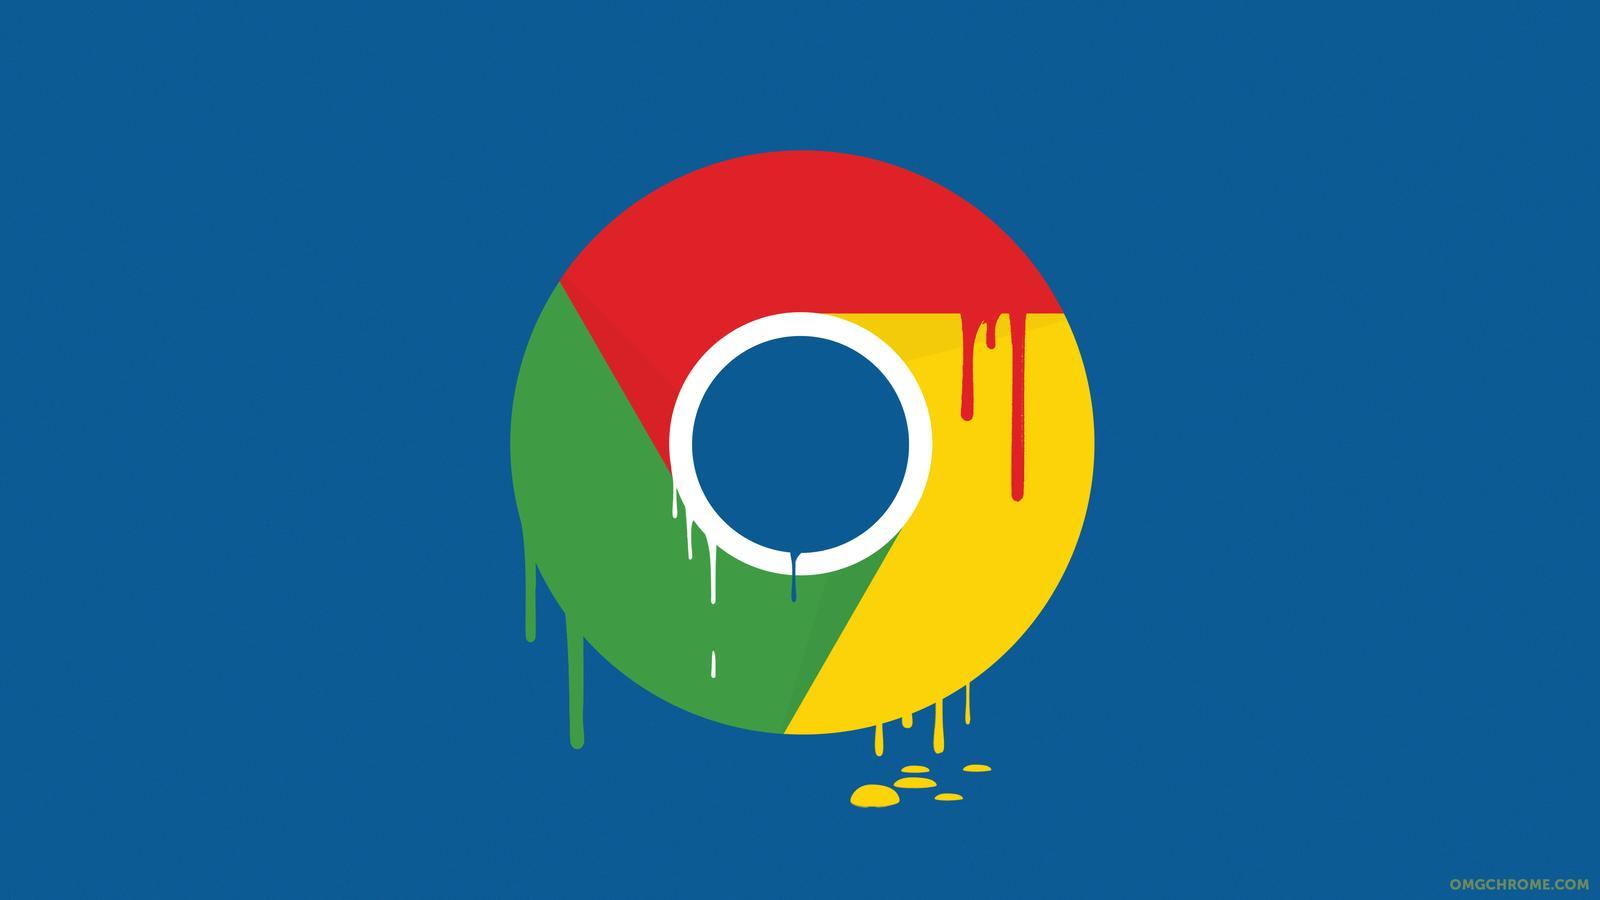 HD Chrome Wallpaper